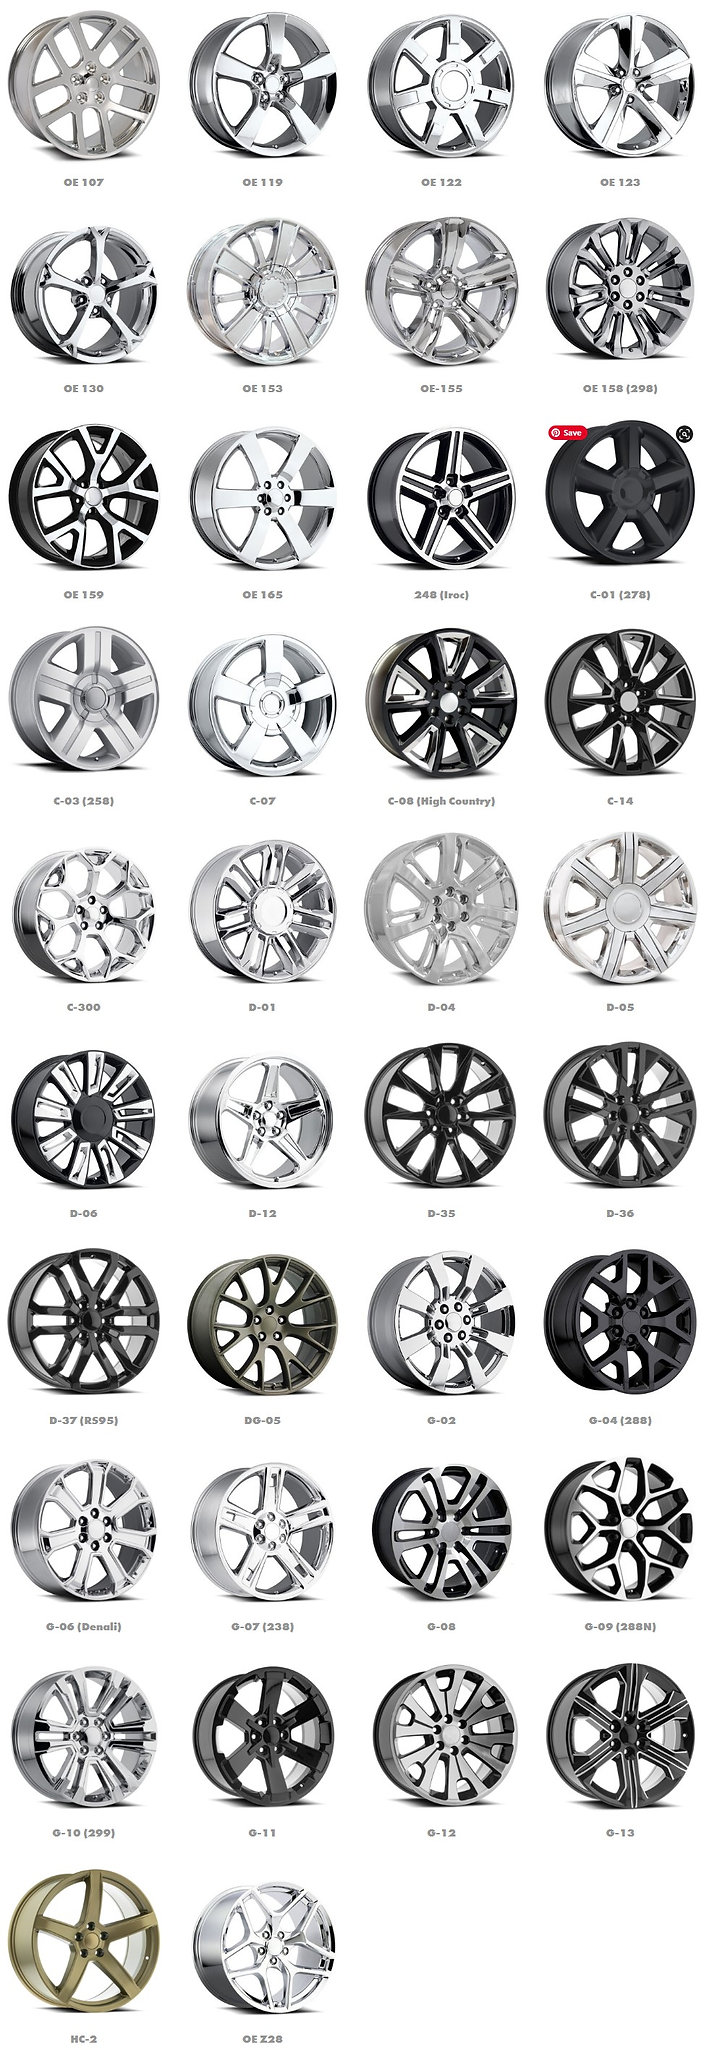 OE Revolution Wheel Options.jpg